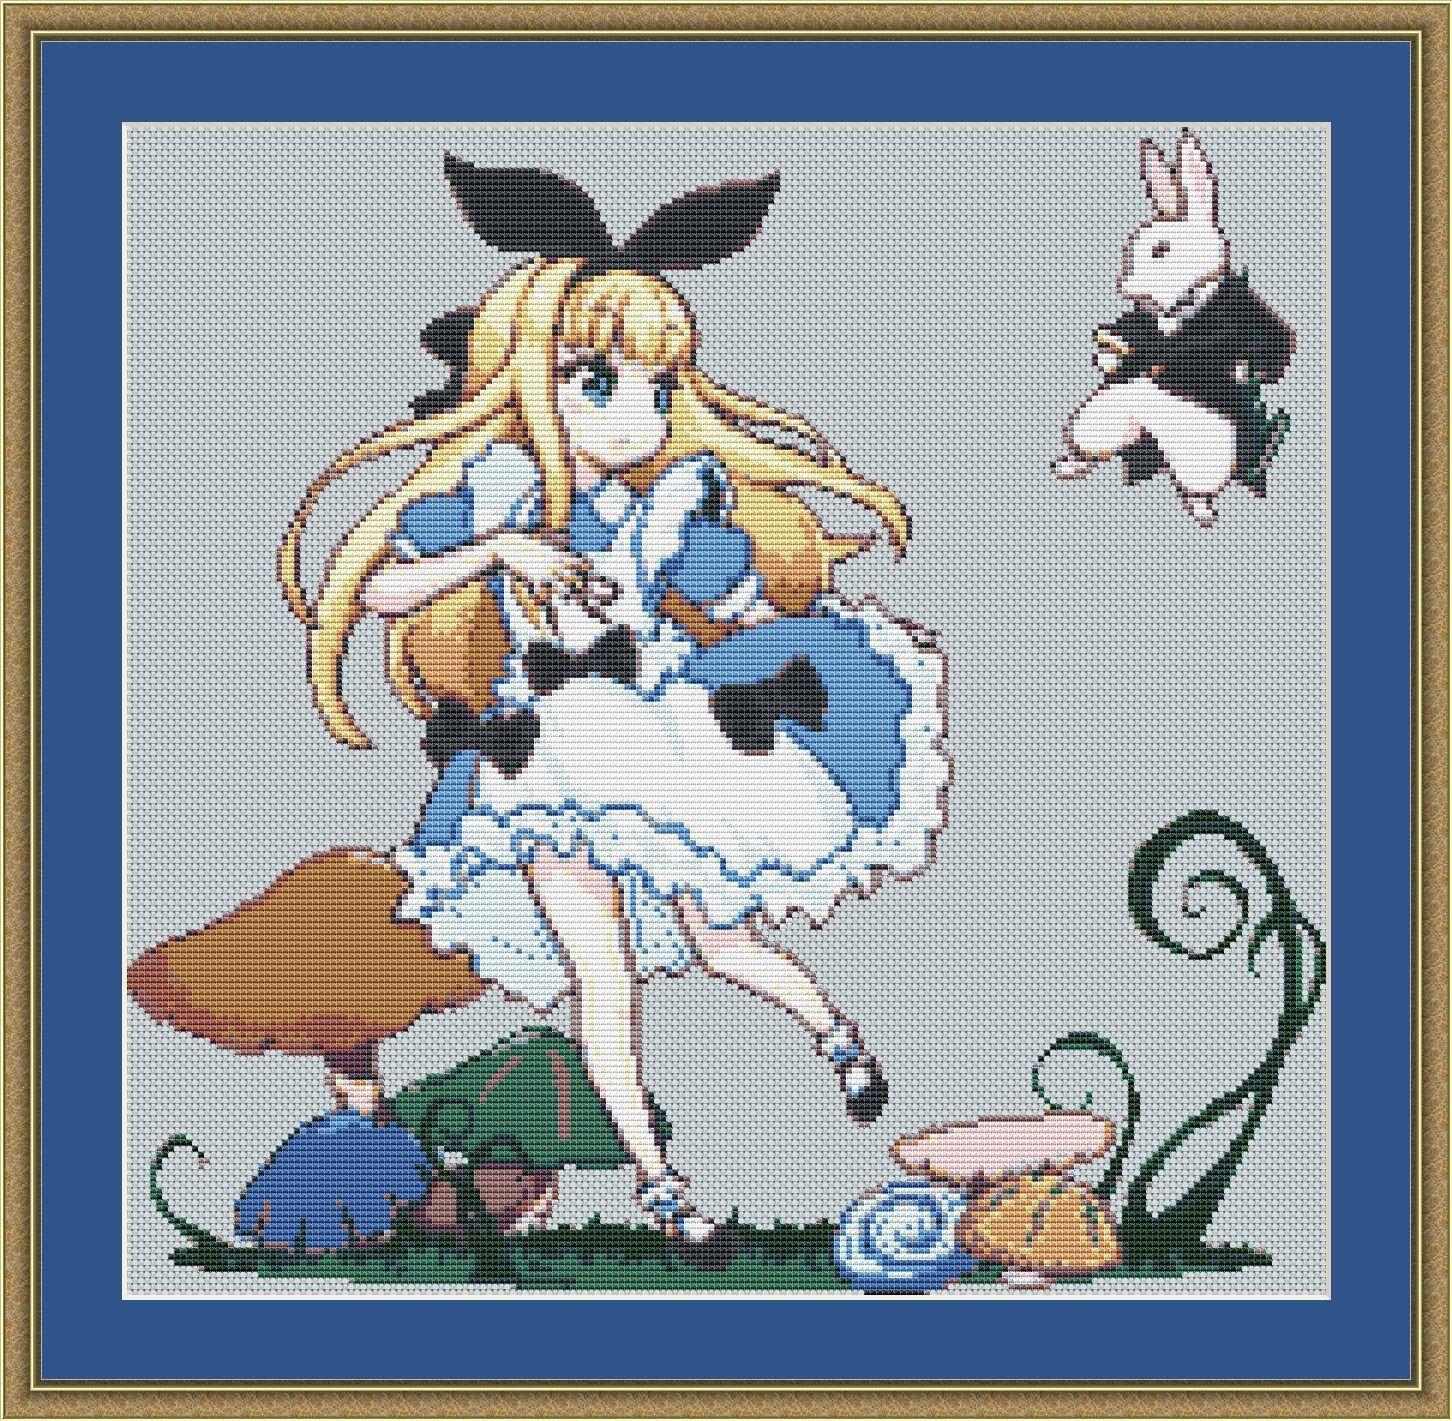 Alice in Wonderland Cross Stitch Pattern, Anime Cross